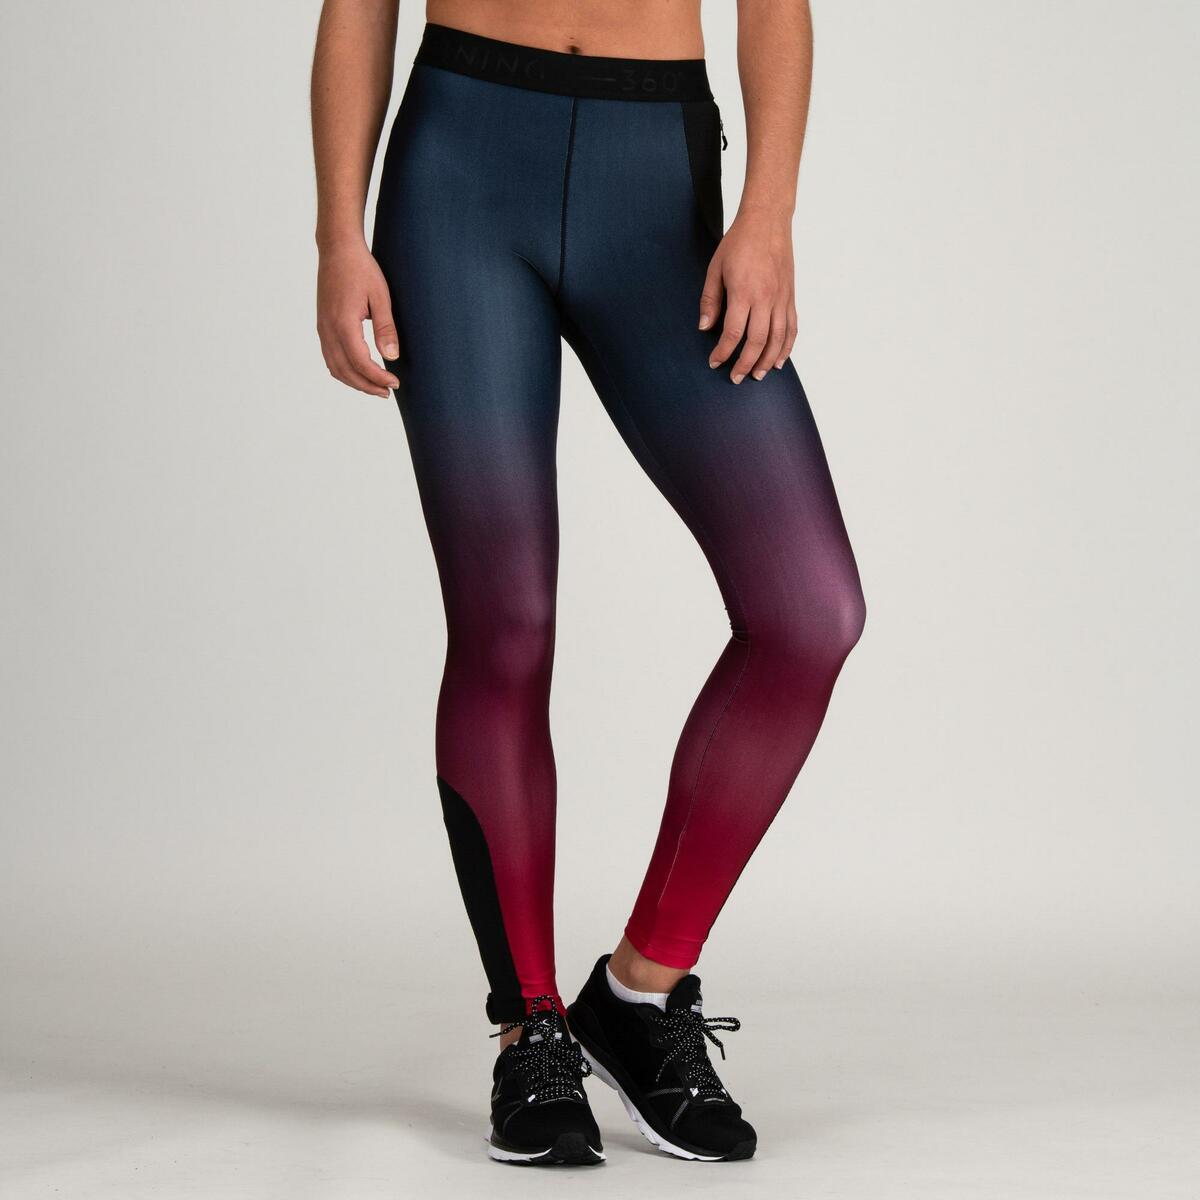 Bild 2 von Leggings FTI 500 Fitness Cardio Damen bordeaux